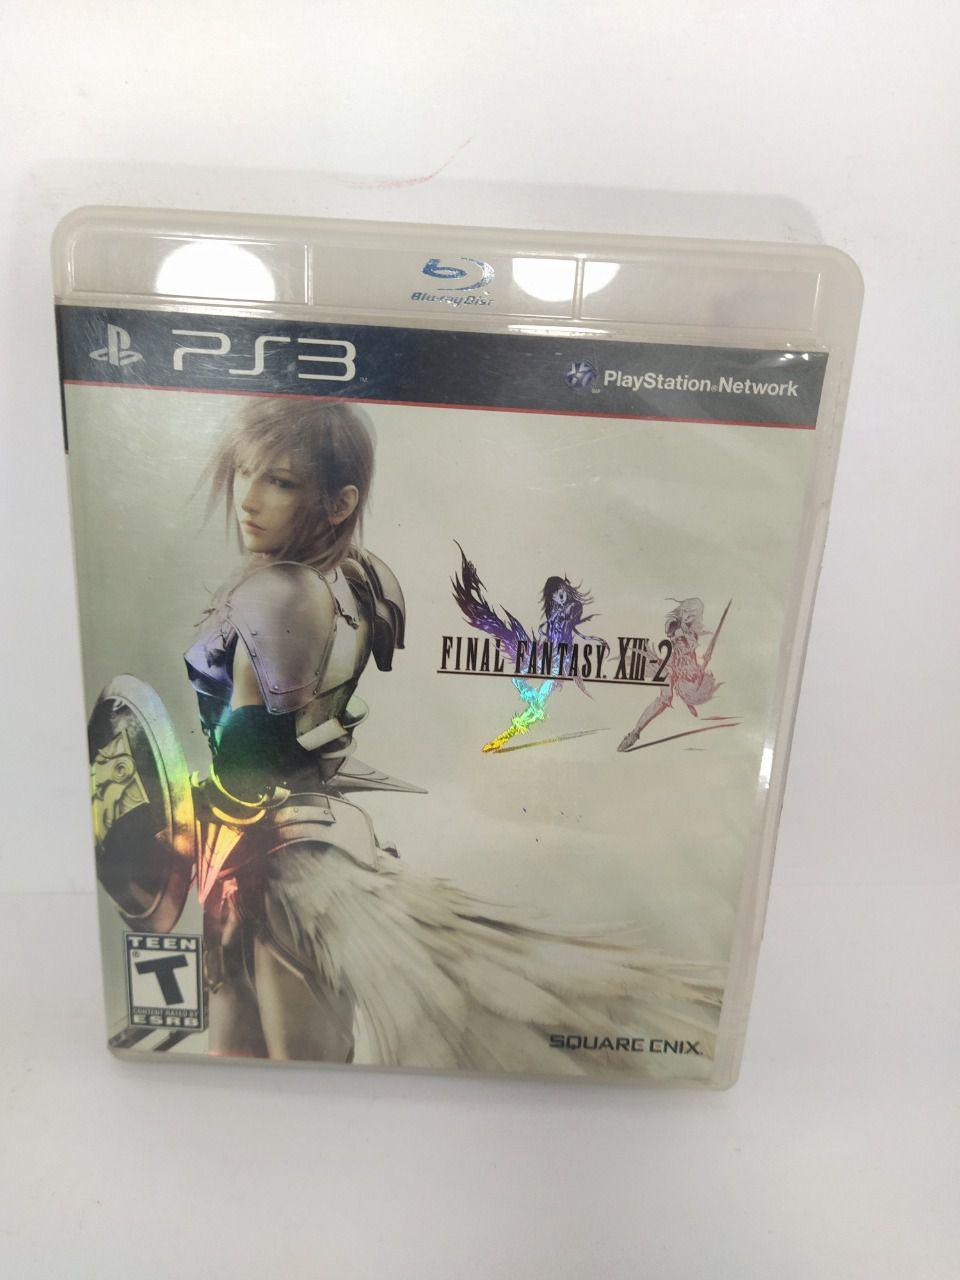 Jogo Ps3 Final Fantasy XIII-2 Mídia Física Usado